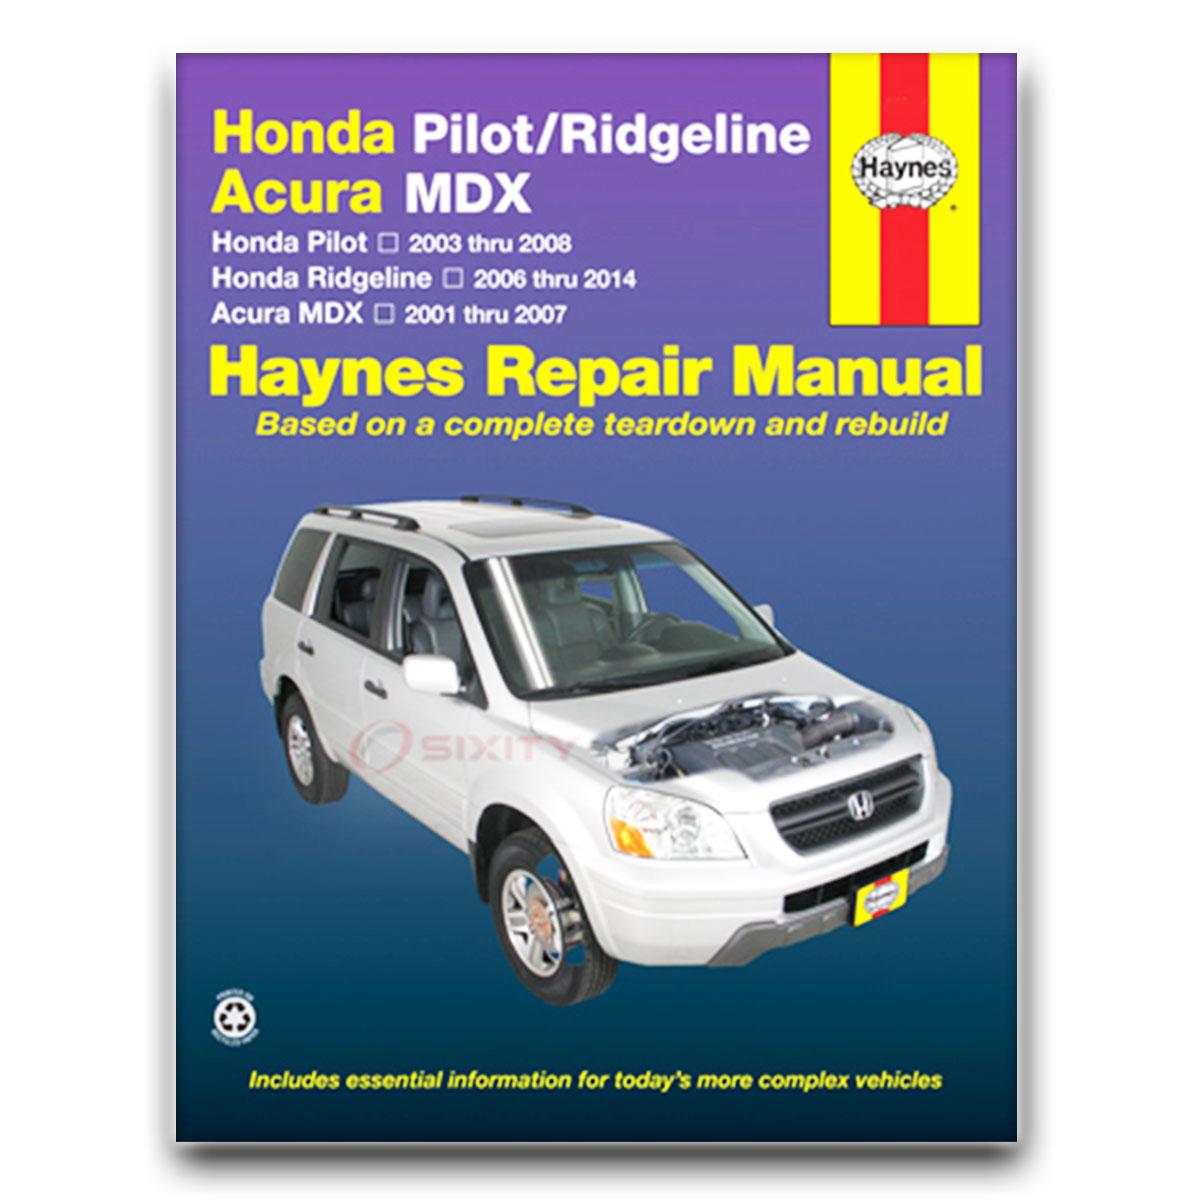 haynes honda pilot 03 07 acura mdx 01 07 repair manual 42037 shop rh ebay com 2005 Acura MDX 2017 Acura MDX